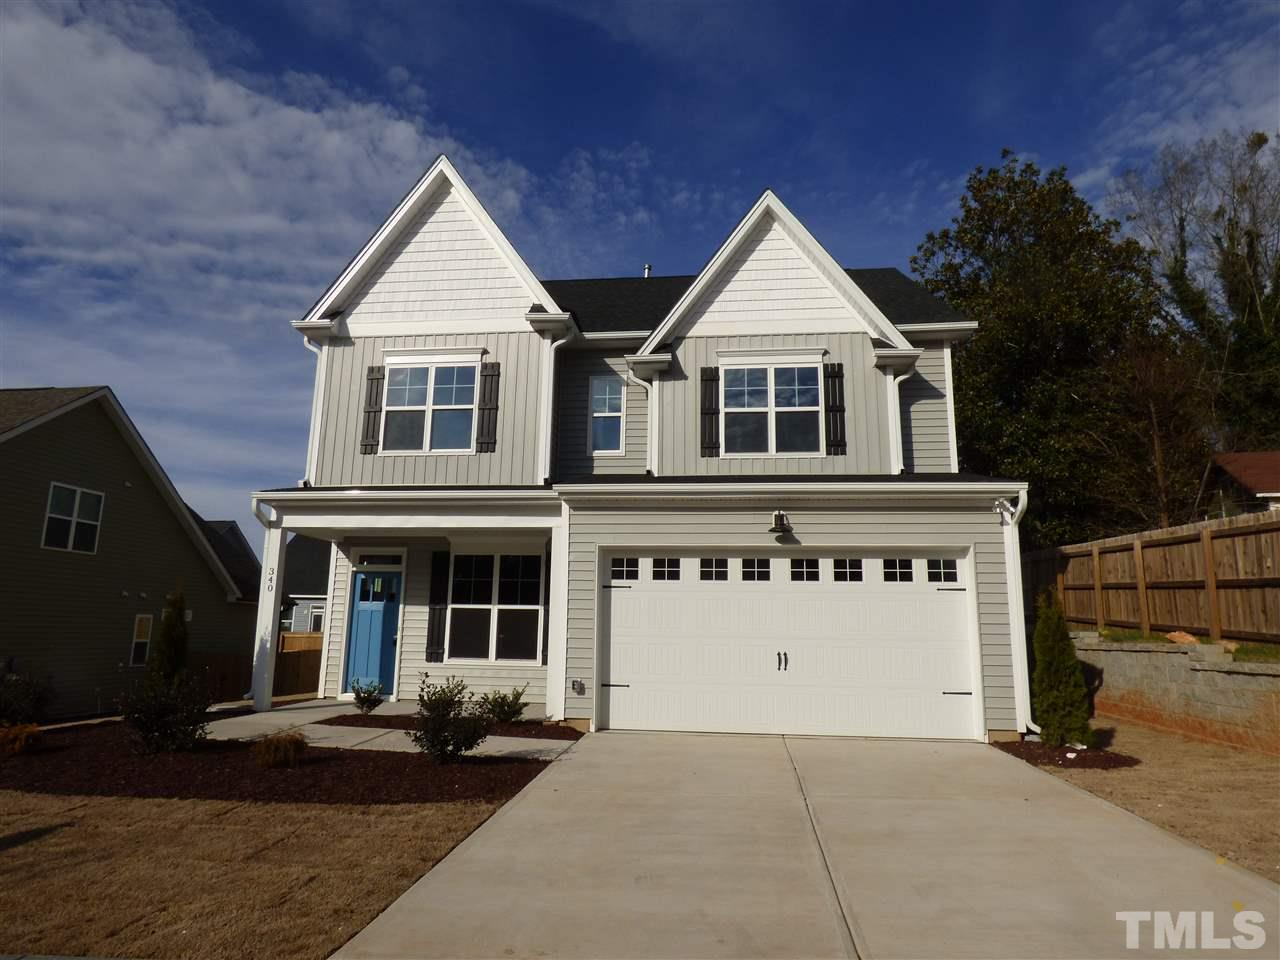 340 Joyner Bluff Drive, The Bluffs at Joyner Park, Wake Forest NC (Homesite 11) - $343,158